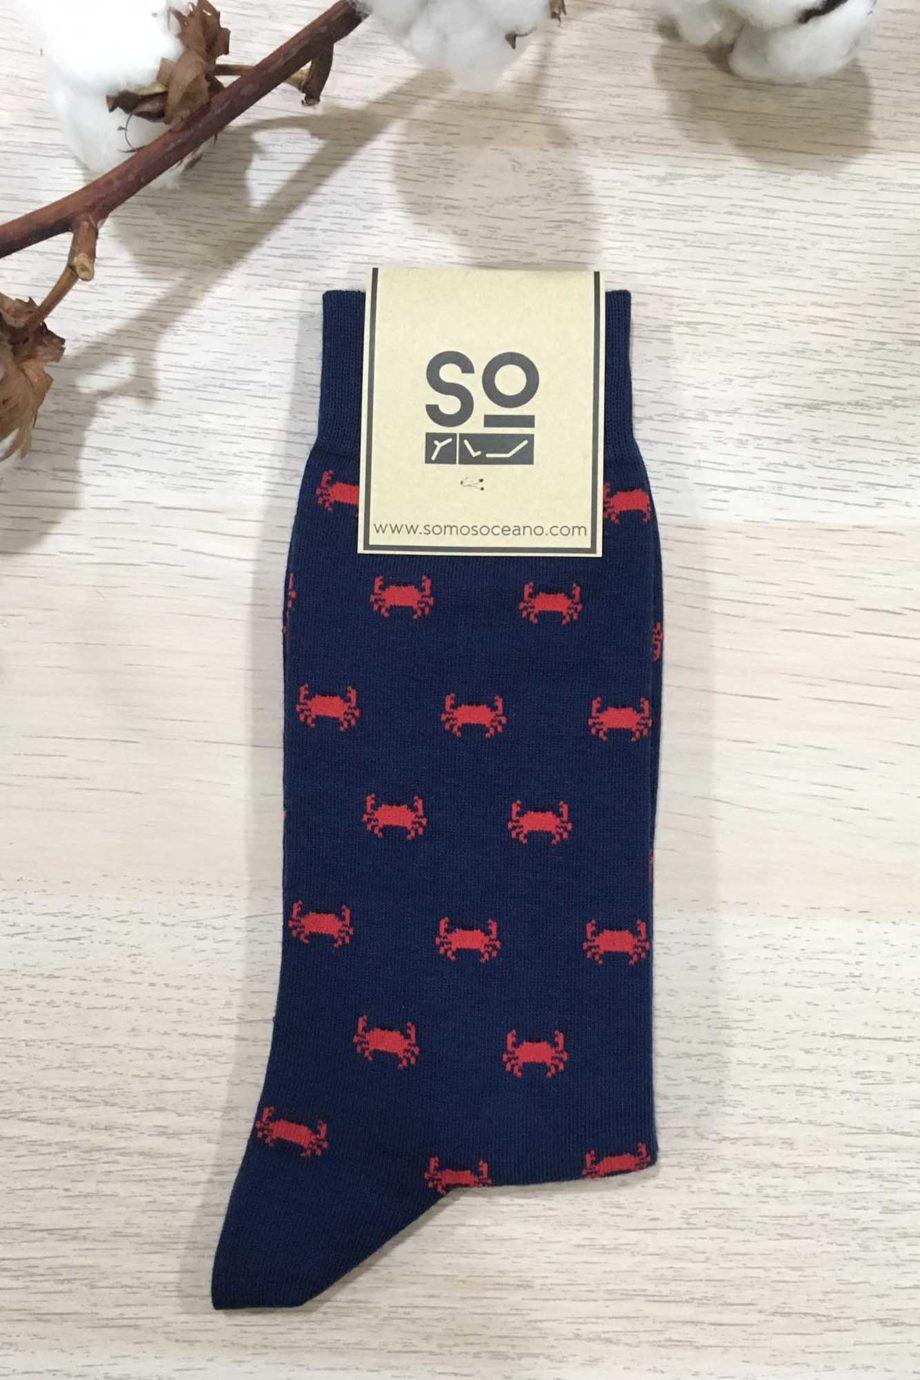 somosoceano-calcetines-necoras-azul